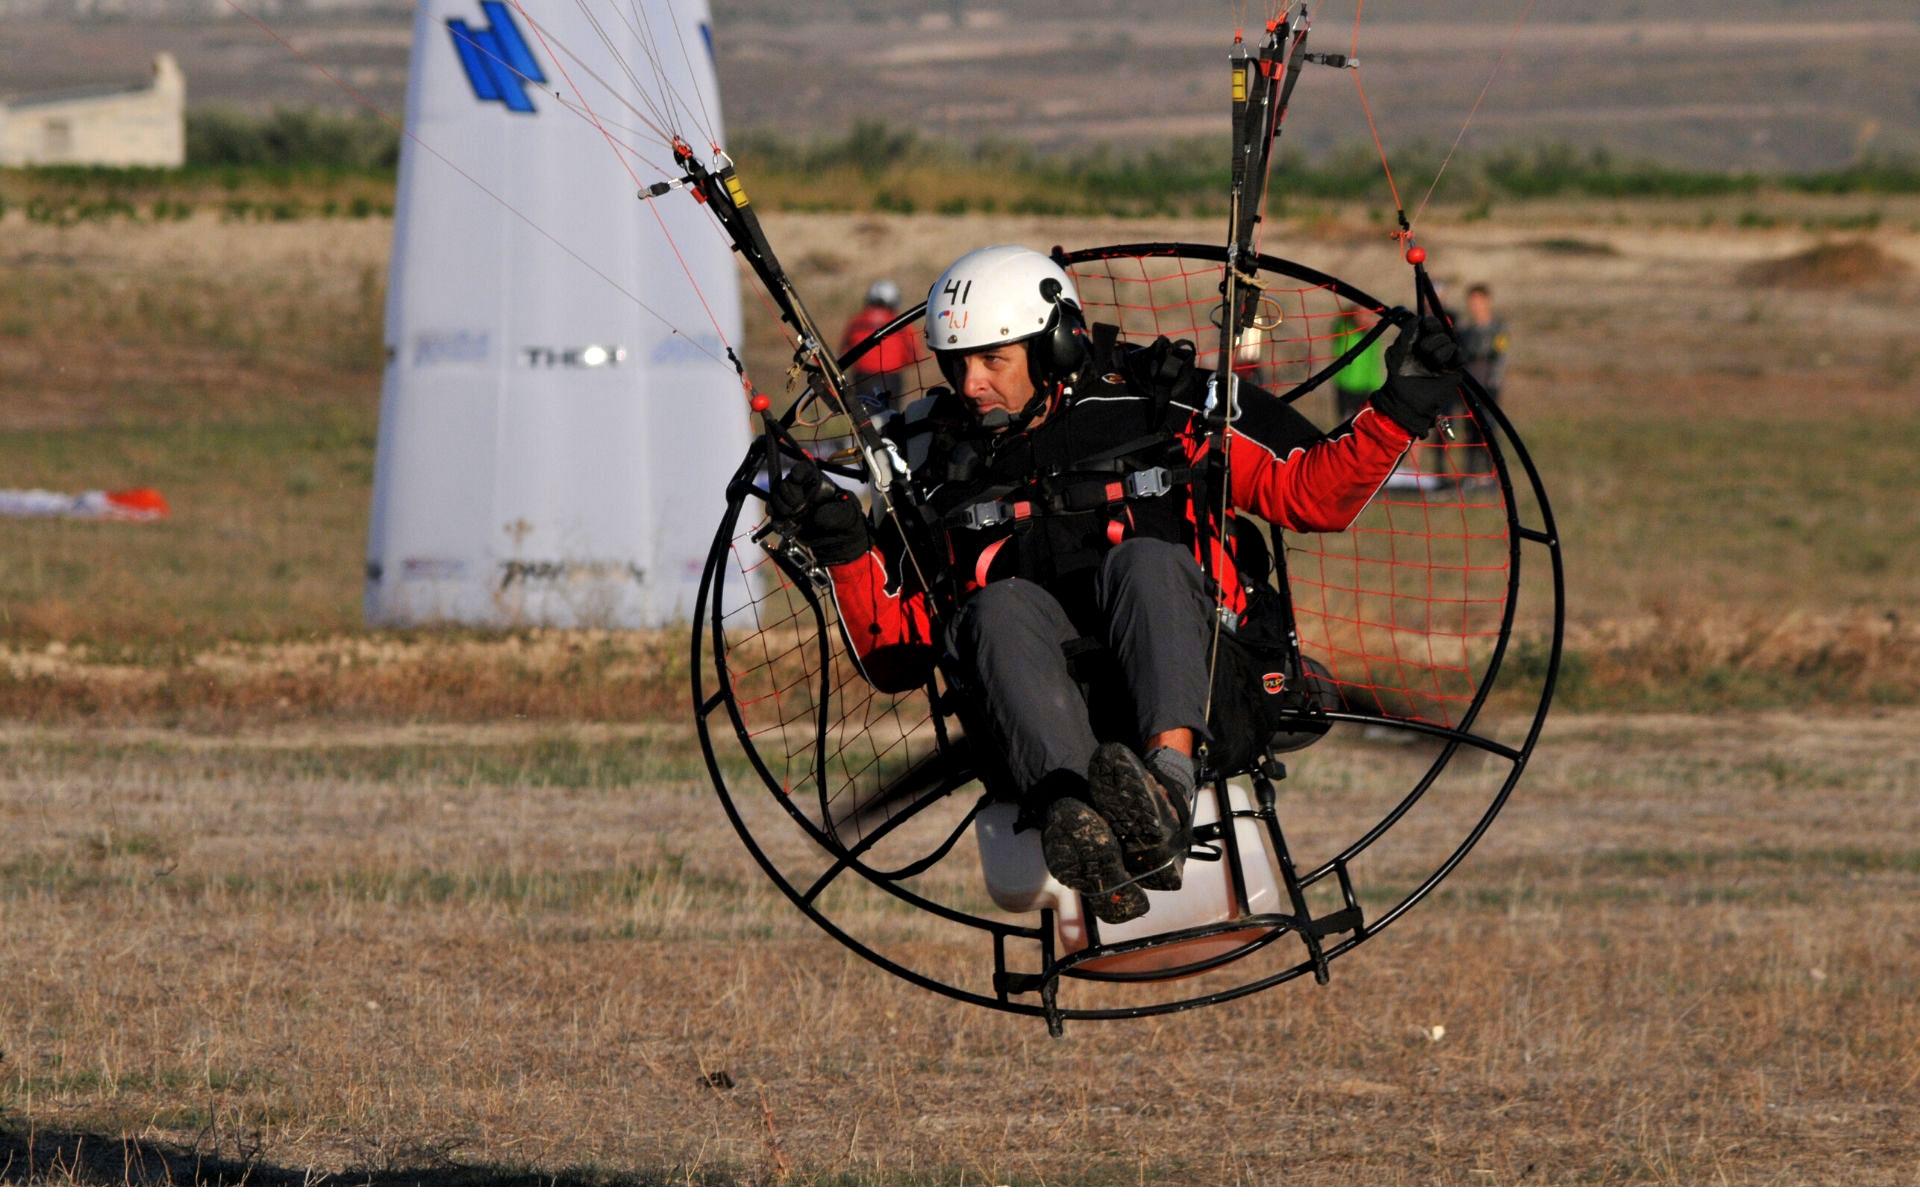 cesar maldonado volando paramotor